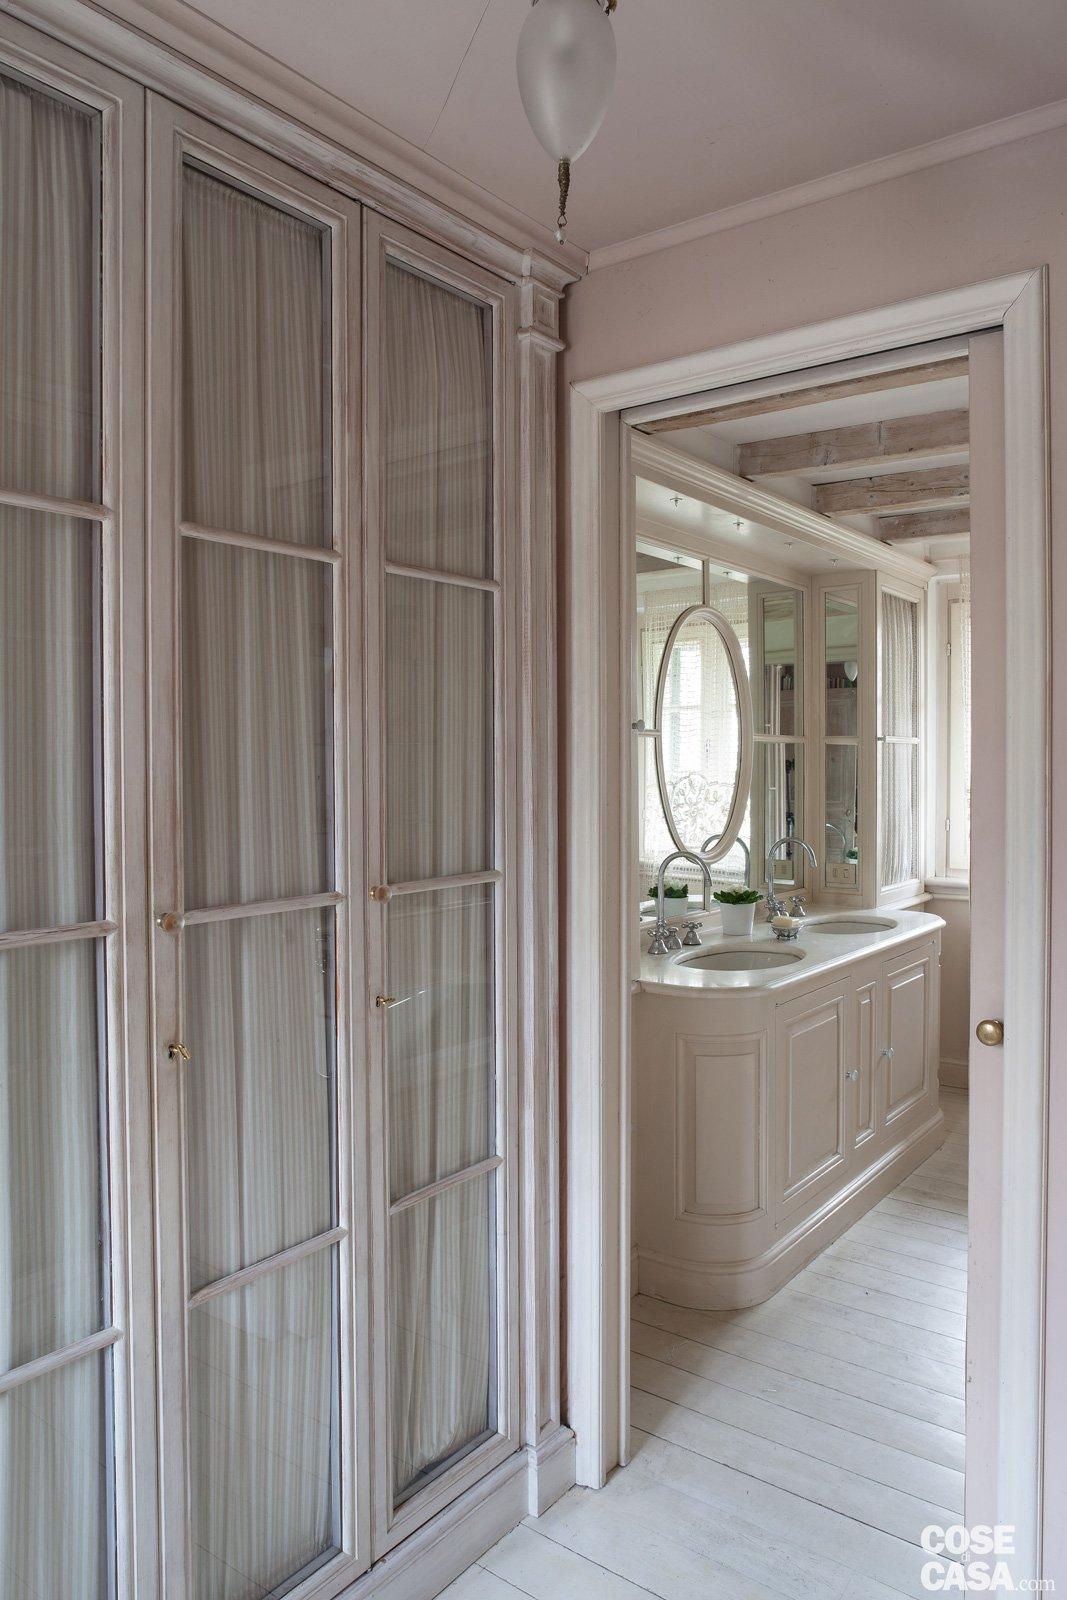 Da cascina a casa chic con travi a vista e soffitti for Disegni di casa chateau francese